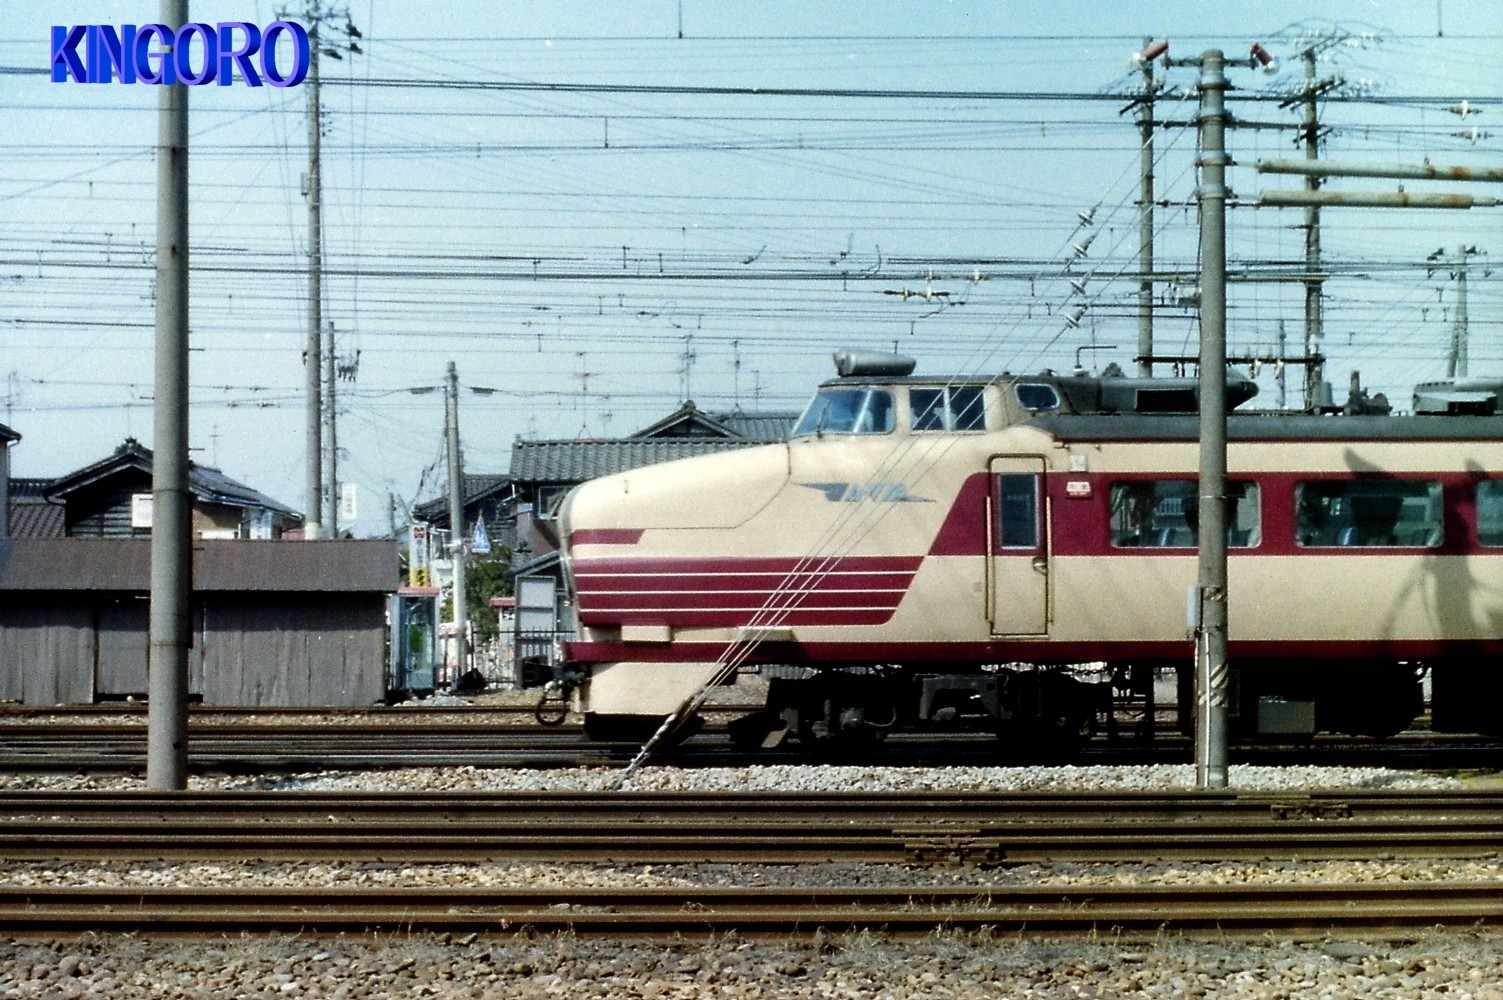 IMAG0065.jpg